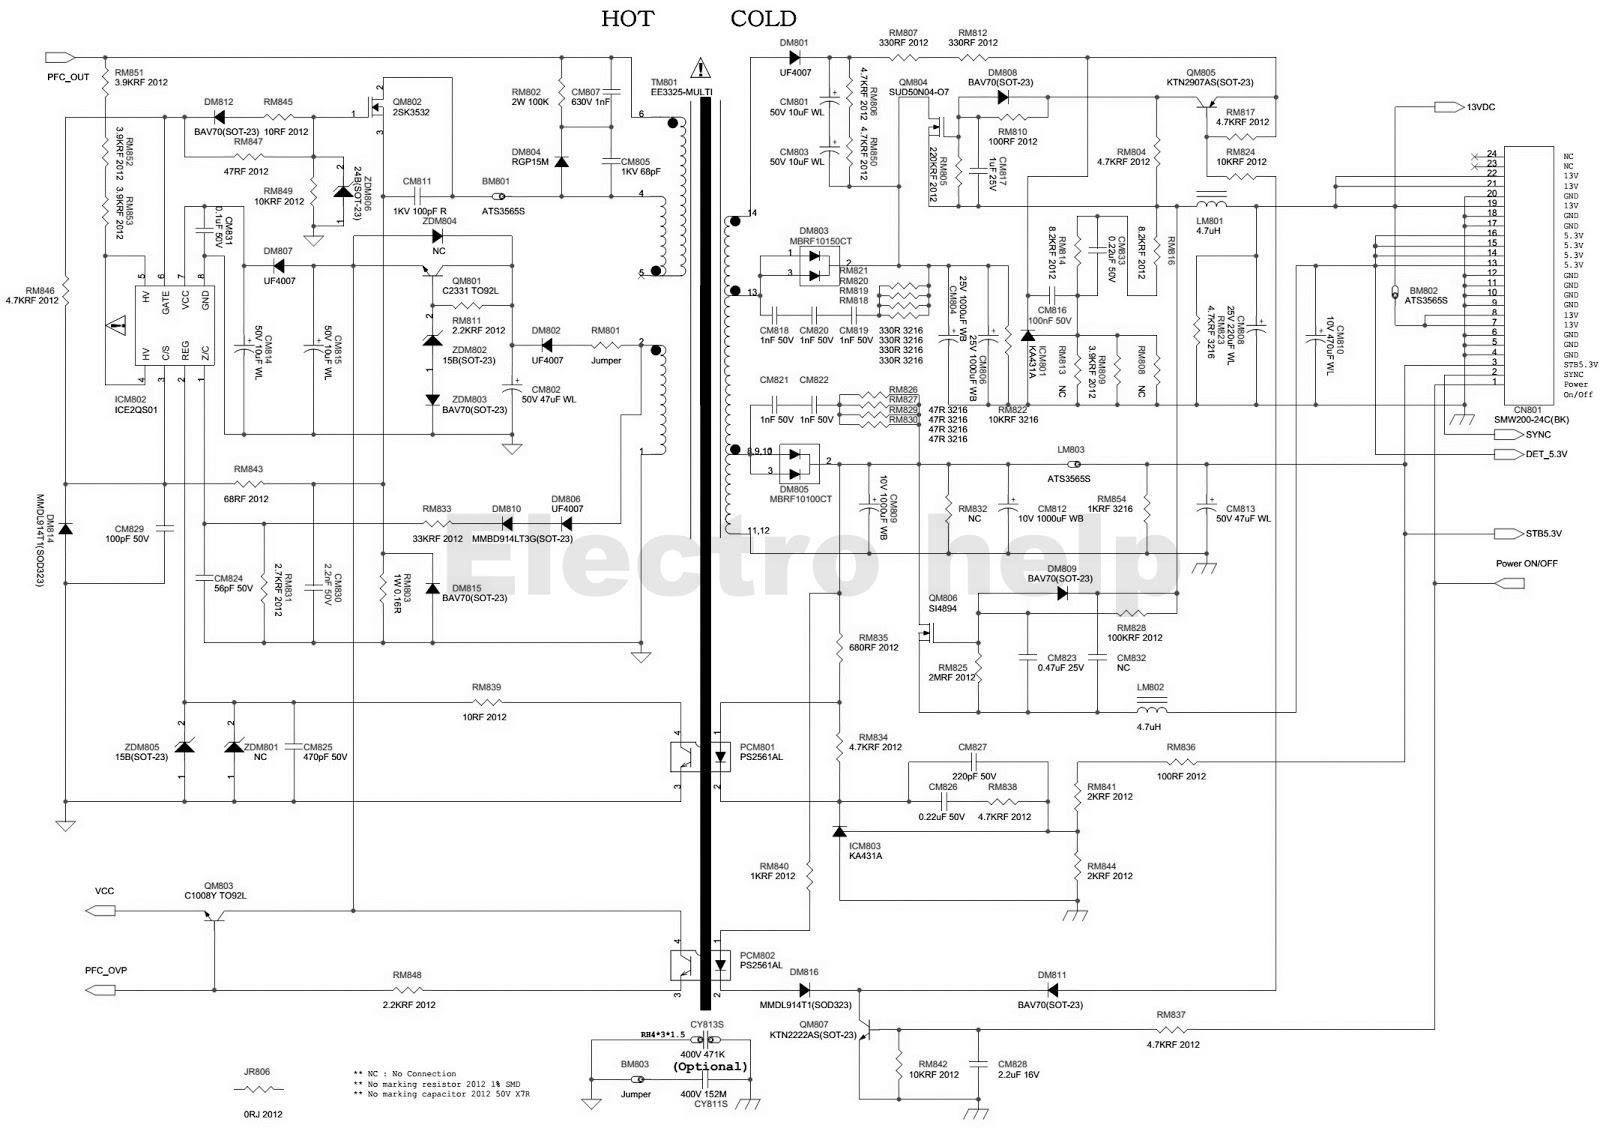 Electro help: BN4400197  SAMSUNG LCD TV POWER SUPPLY